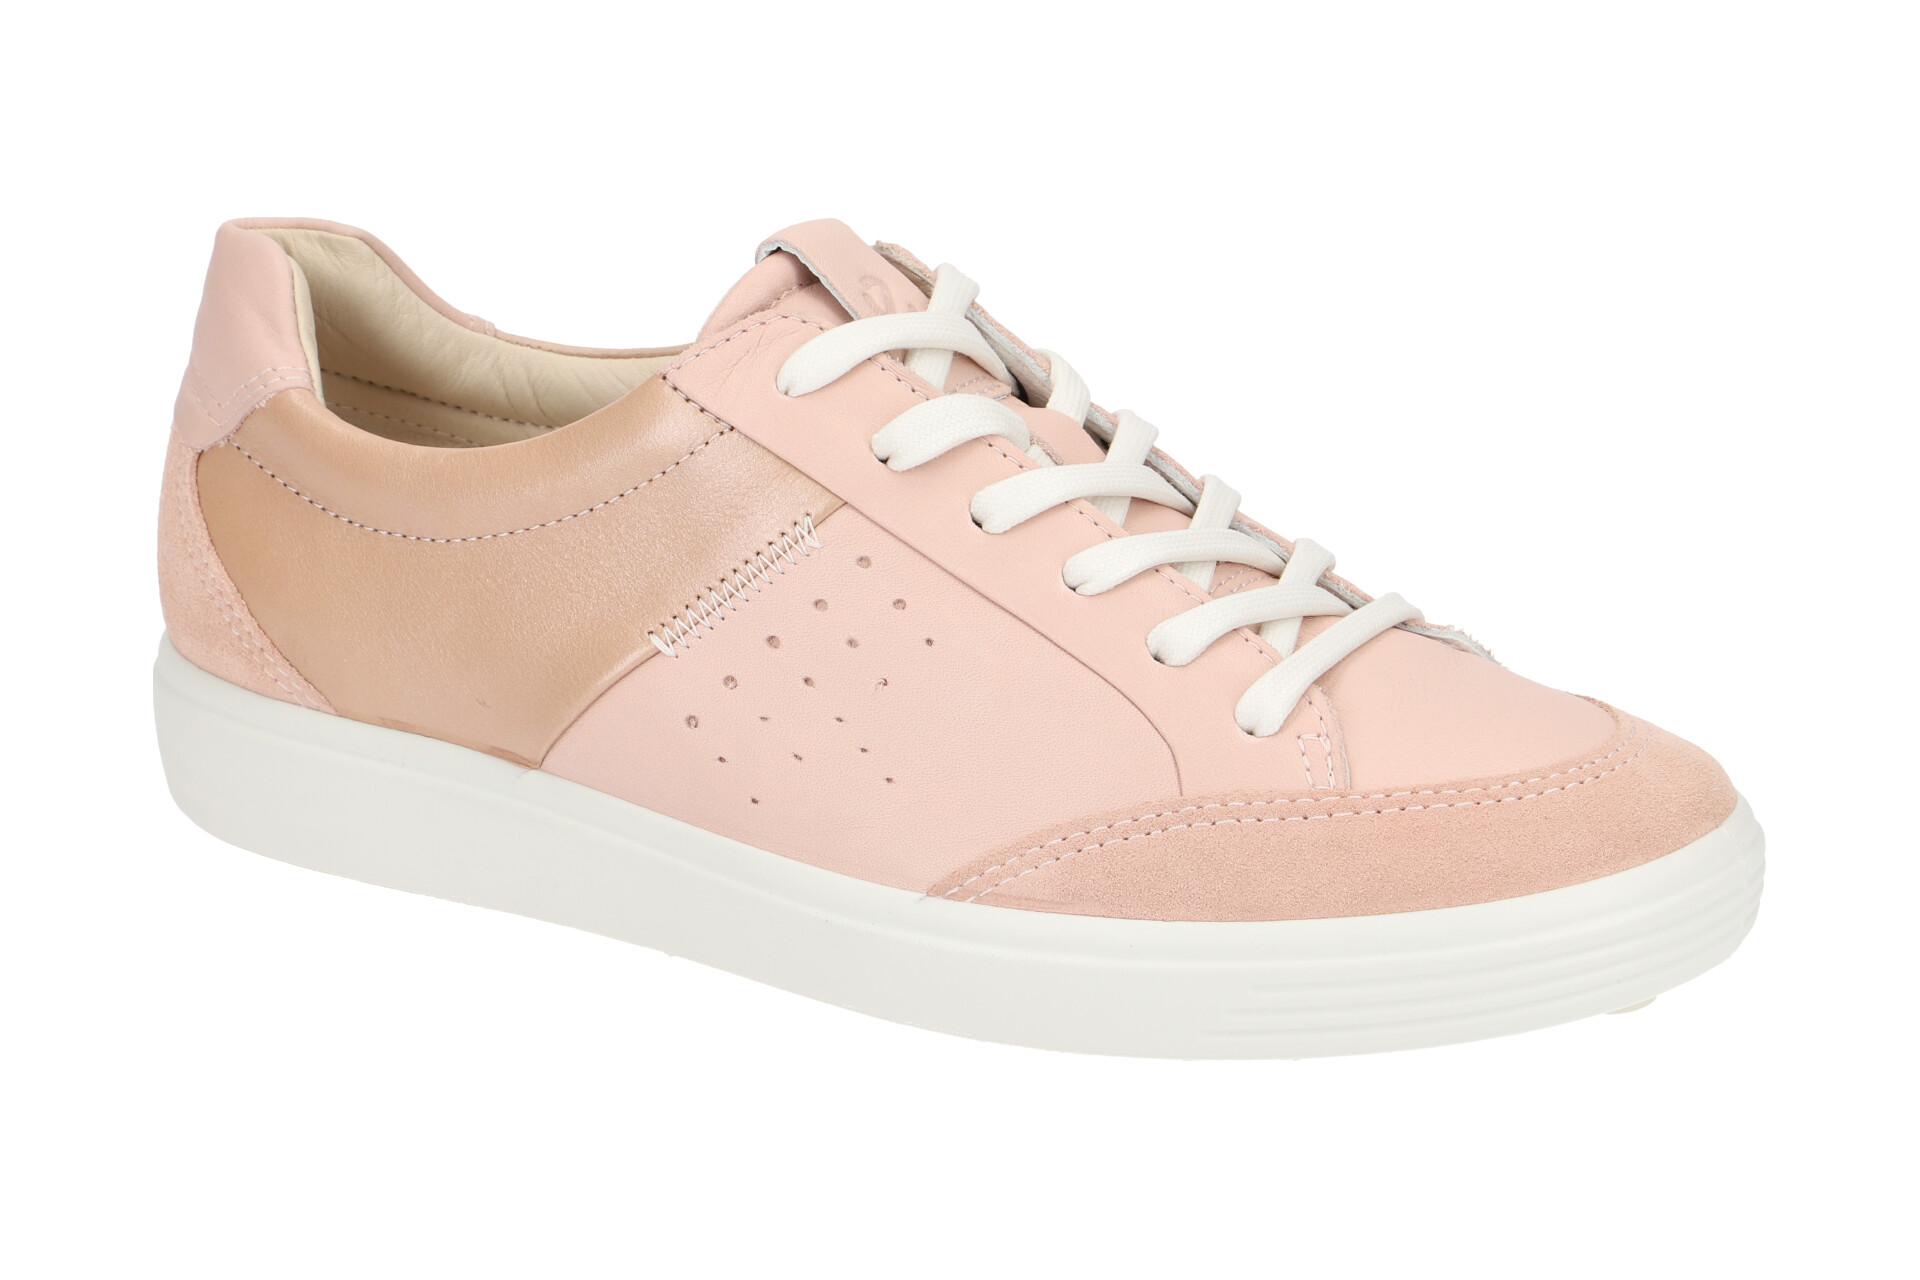 76d9f312ac2d18 ecco Soft 7 Schuhe rosa Sneakers - Schuhhaus Strauch Shop